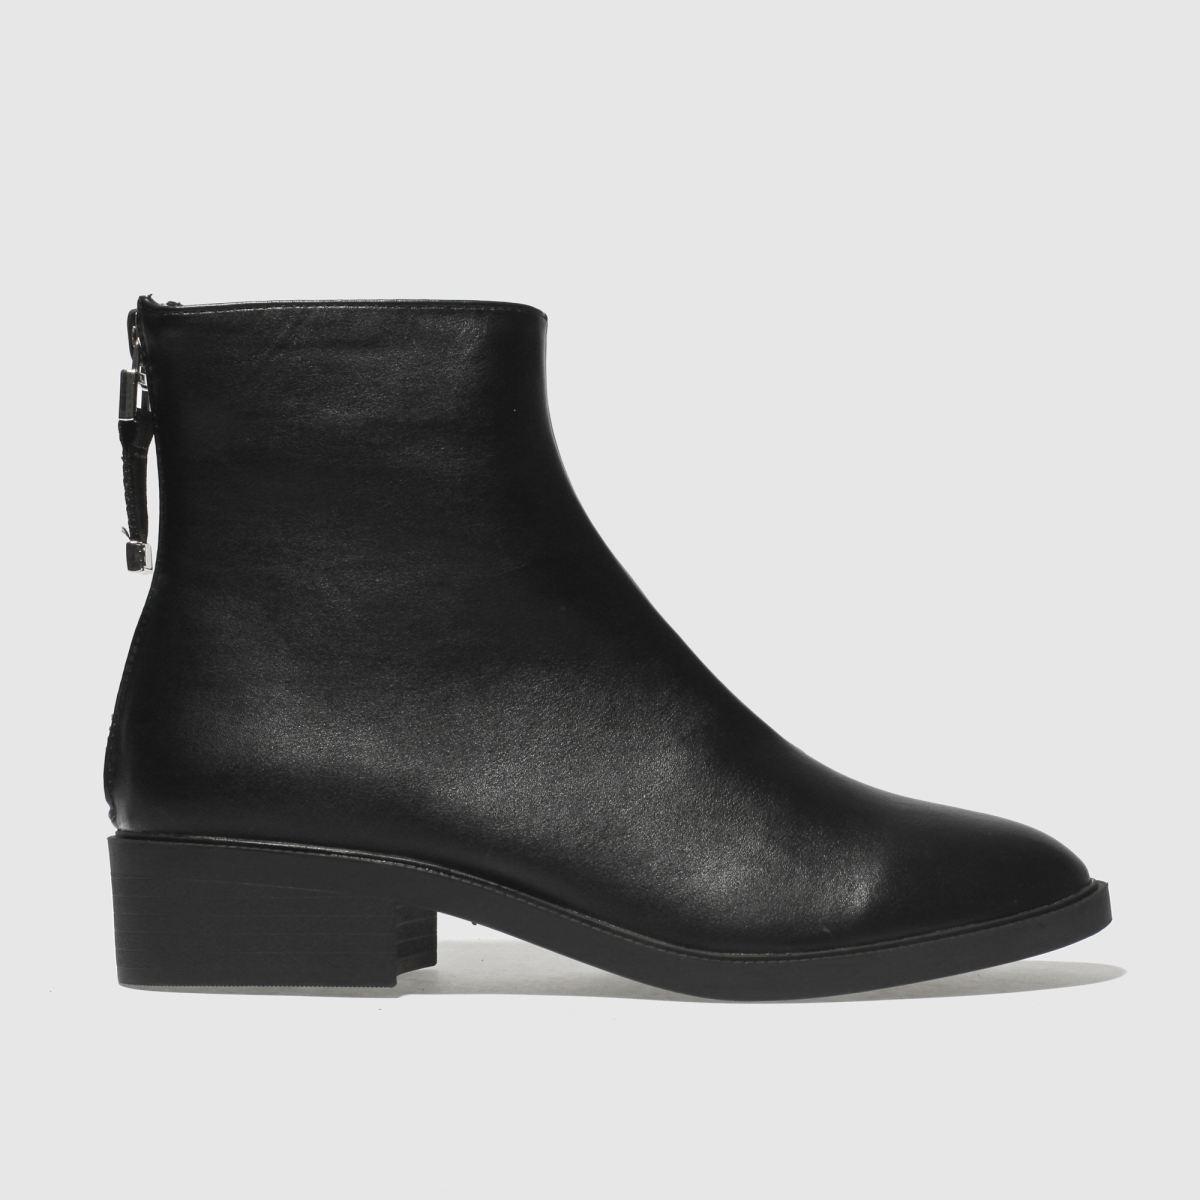 Schuh Black Empowerment Boots